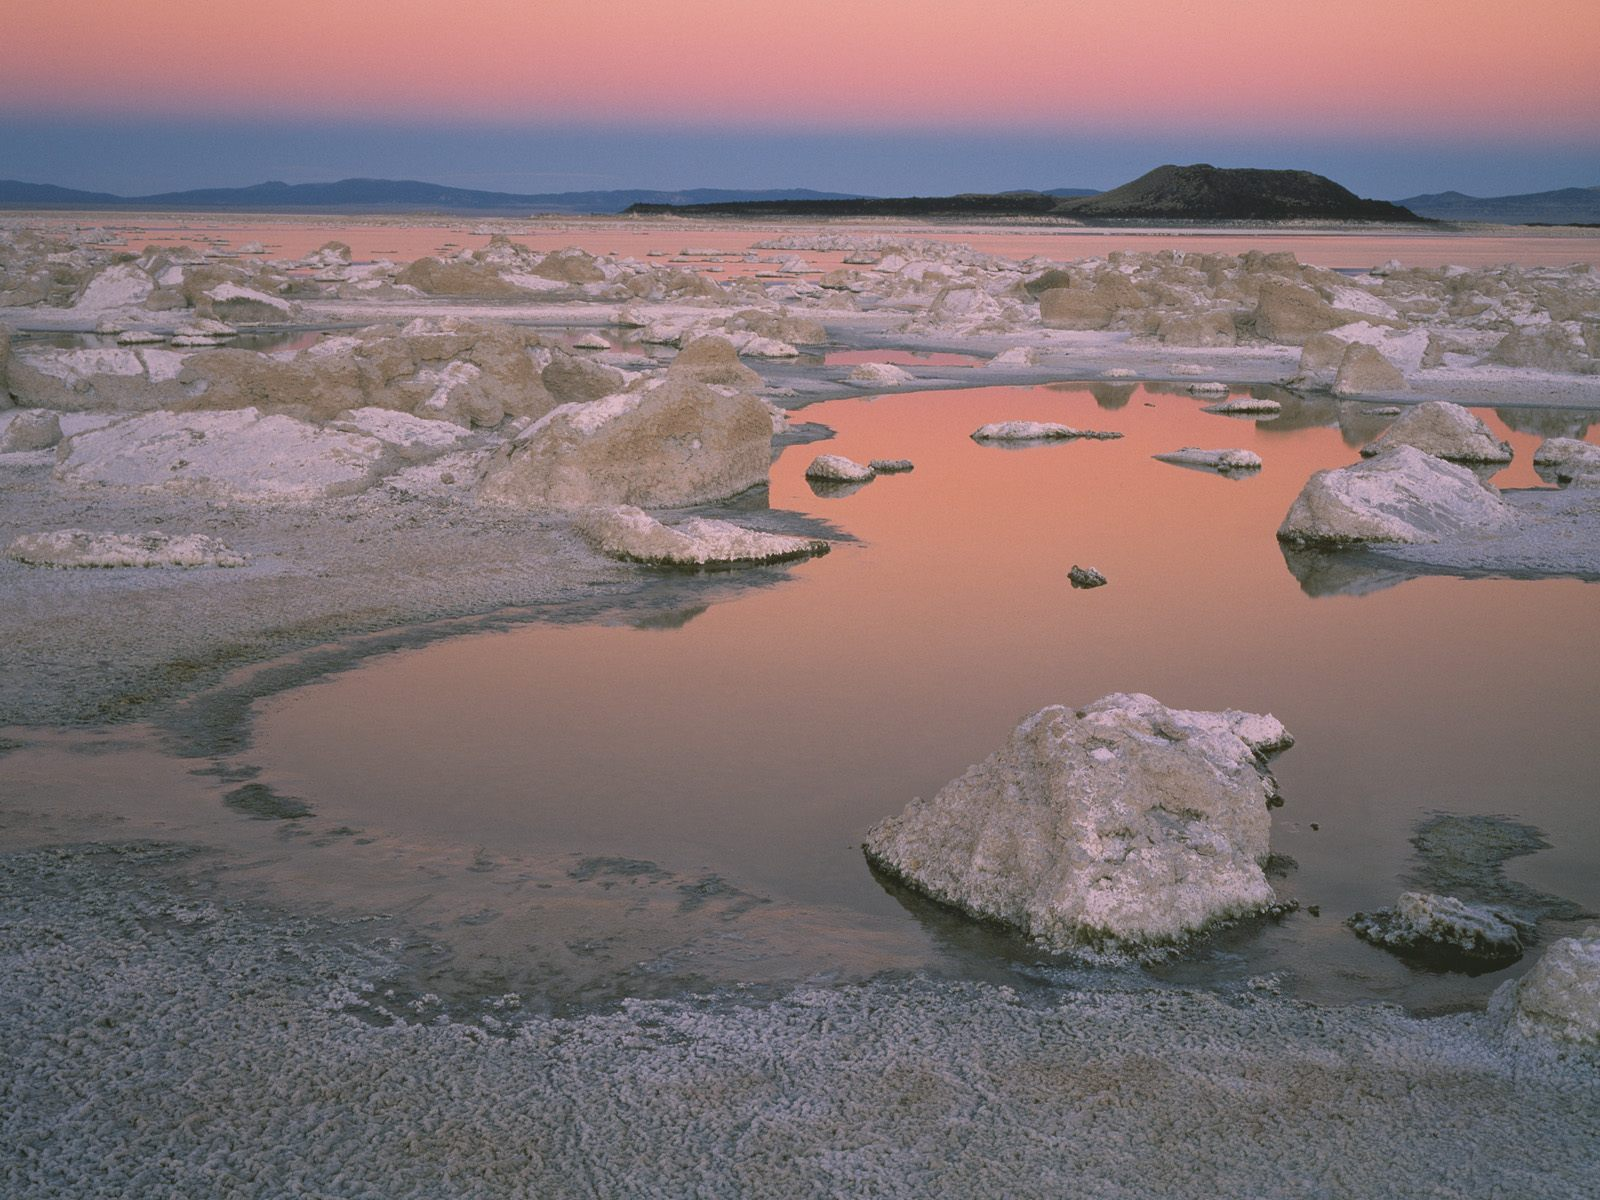 http://3.bp.blogspot.com/_HkbWdsz-H8g/S74GDyIHBnI/AAAAAAAAIl0/XryoH-oS6-w/s1600/Pink+Twilight+at+Mono+Lake,+California.jpg